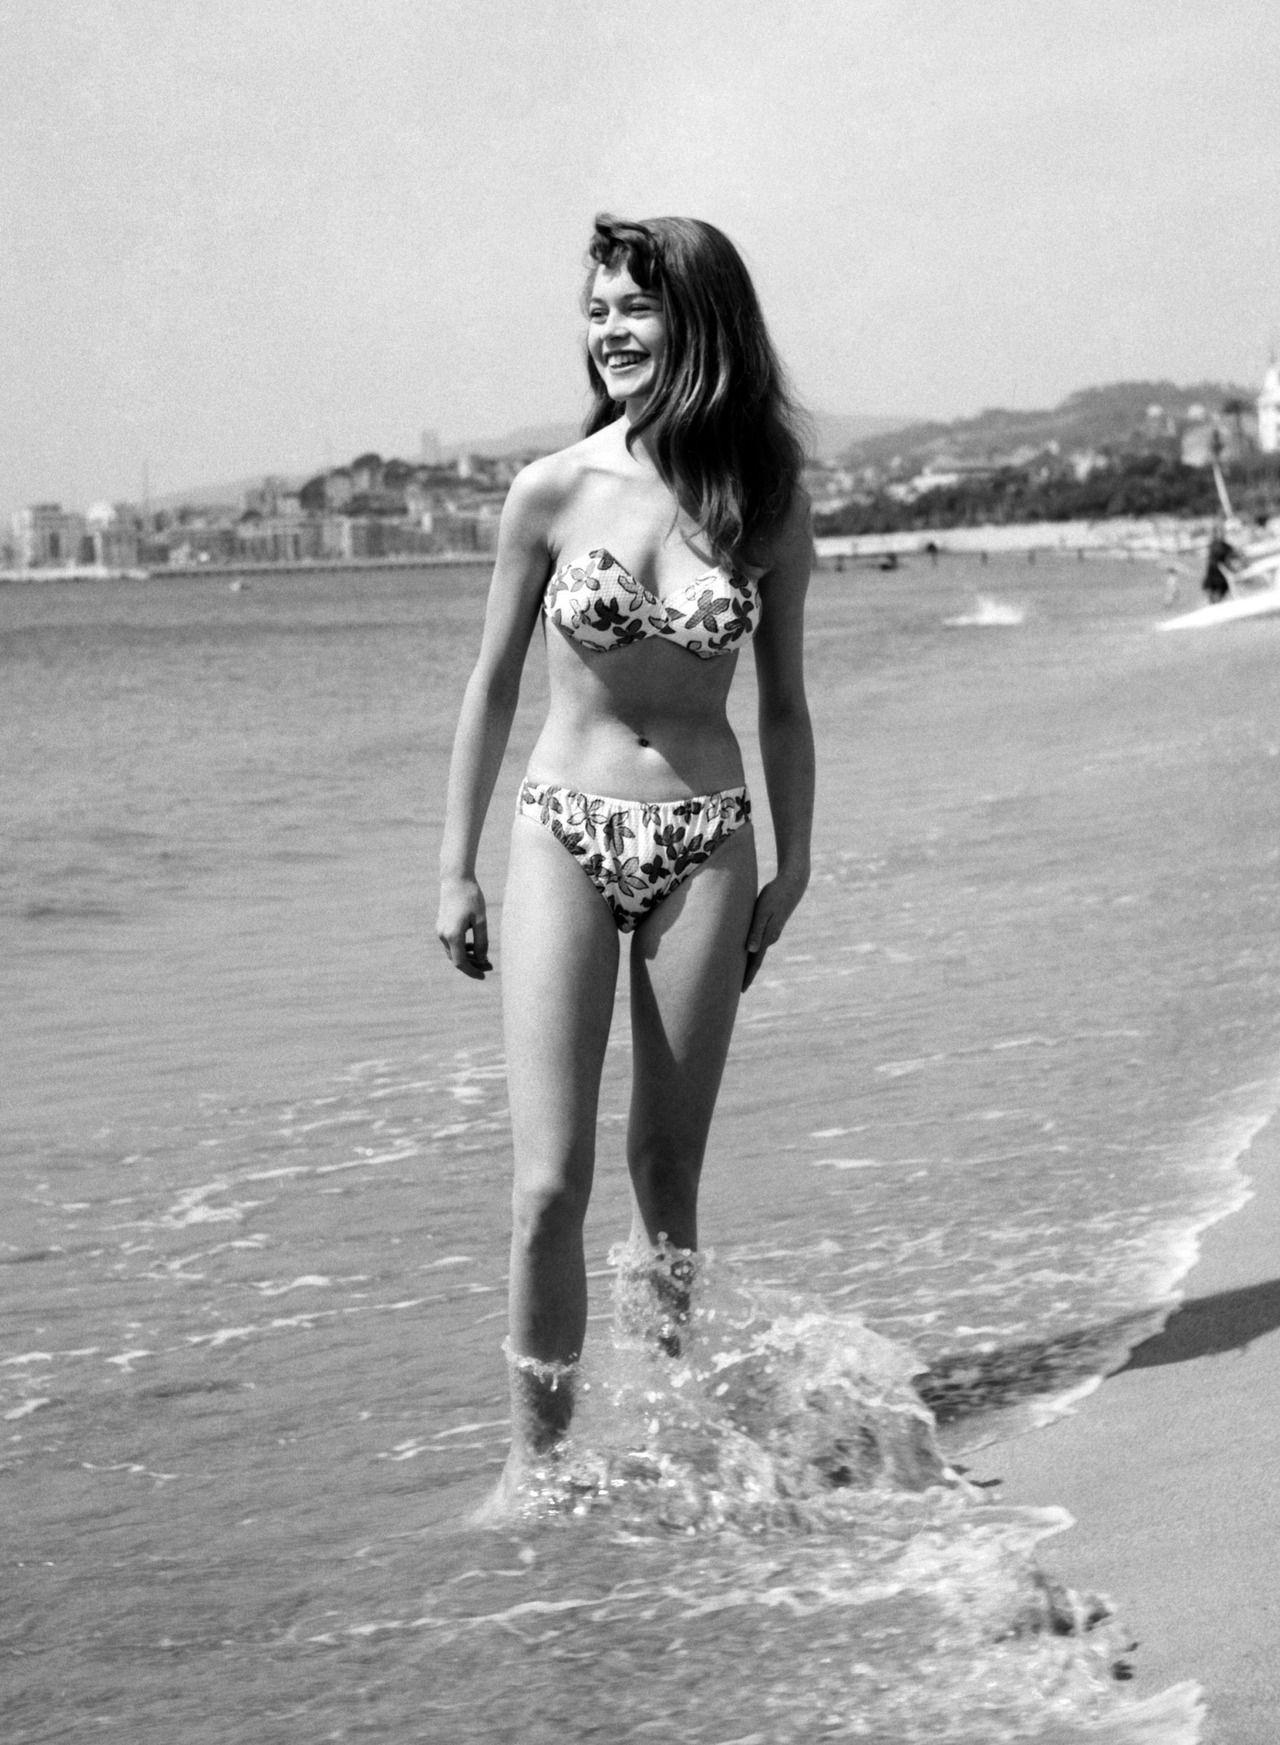 Celebrity photos brigitte bardot topless on a beach photo print